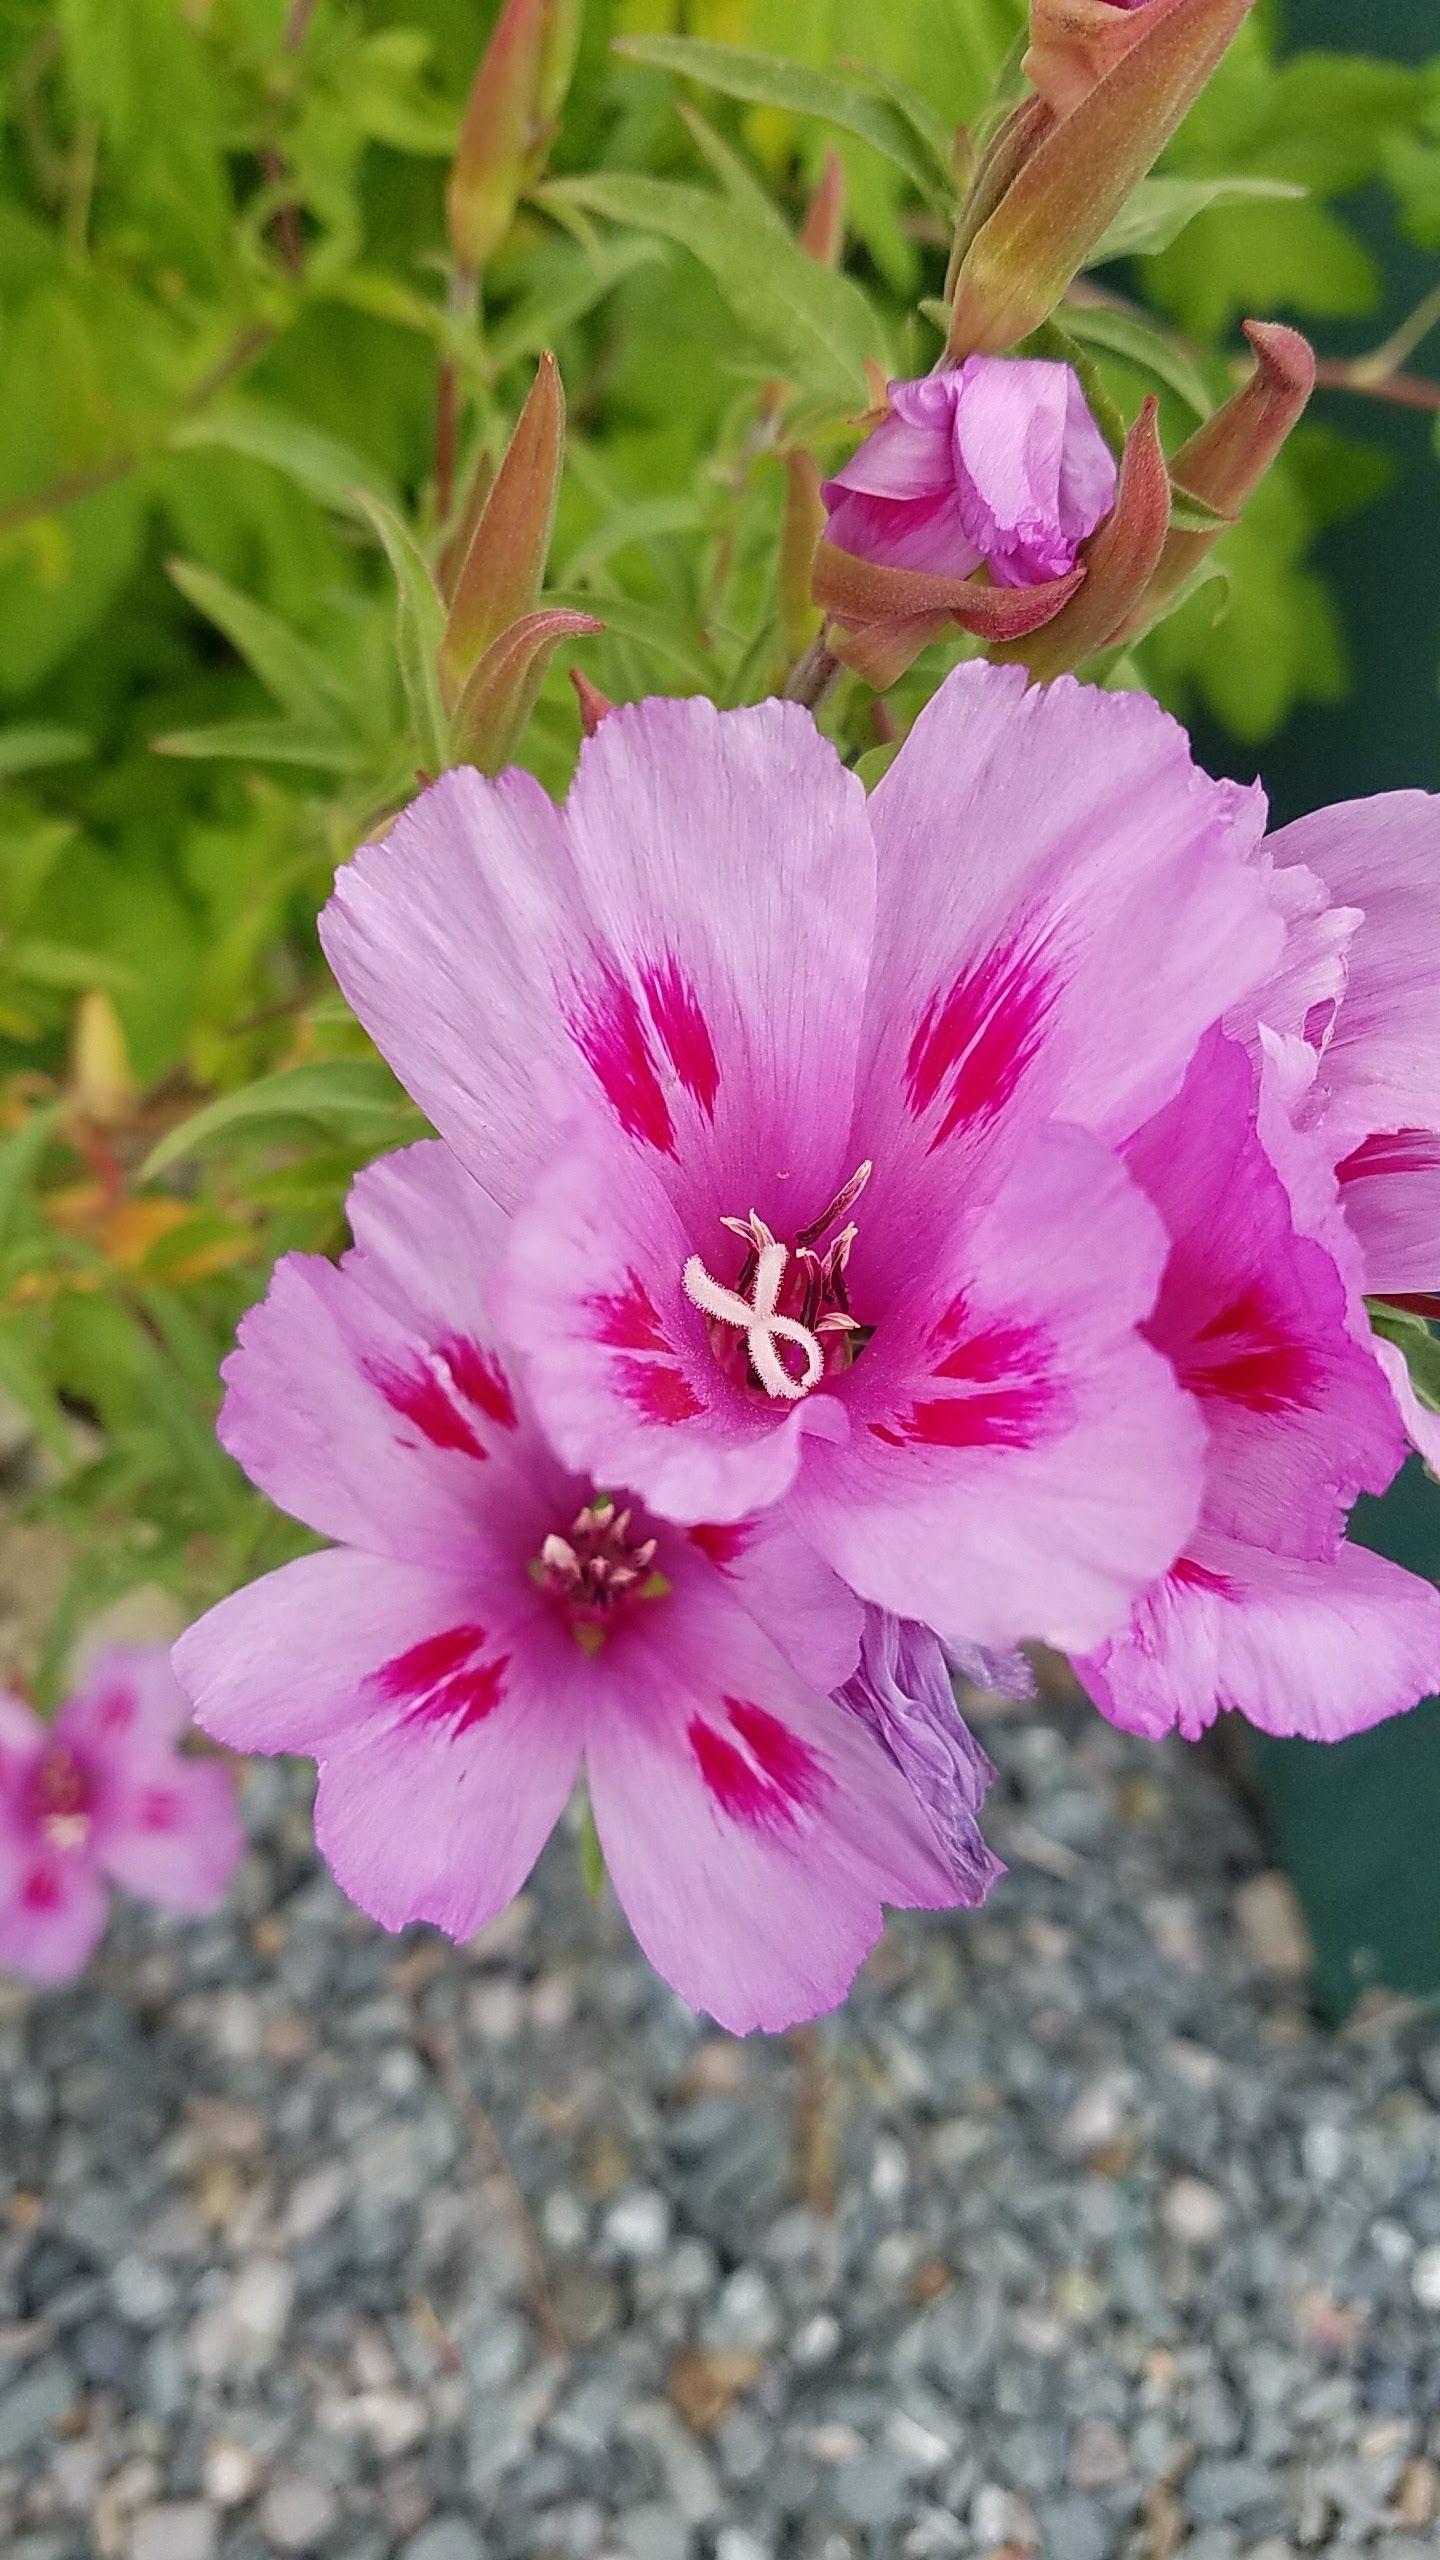 Clarkia Amoena In 2020 Flower Show Flower Bud Pink Flowers